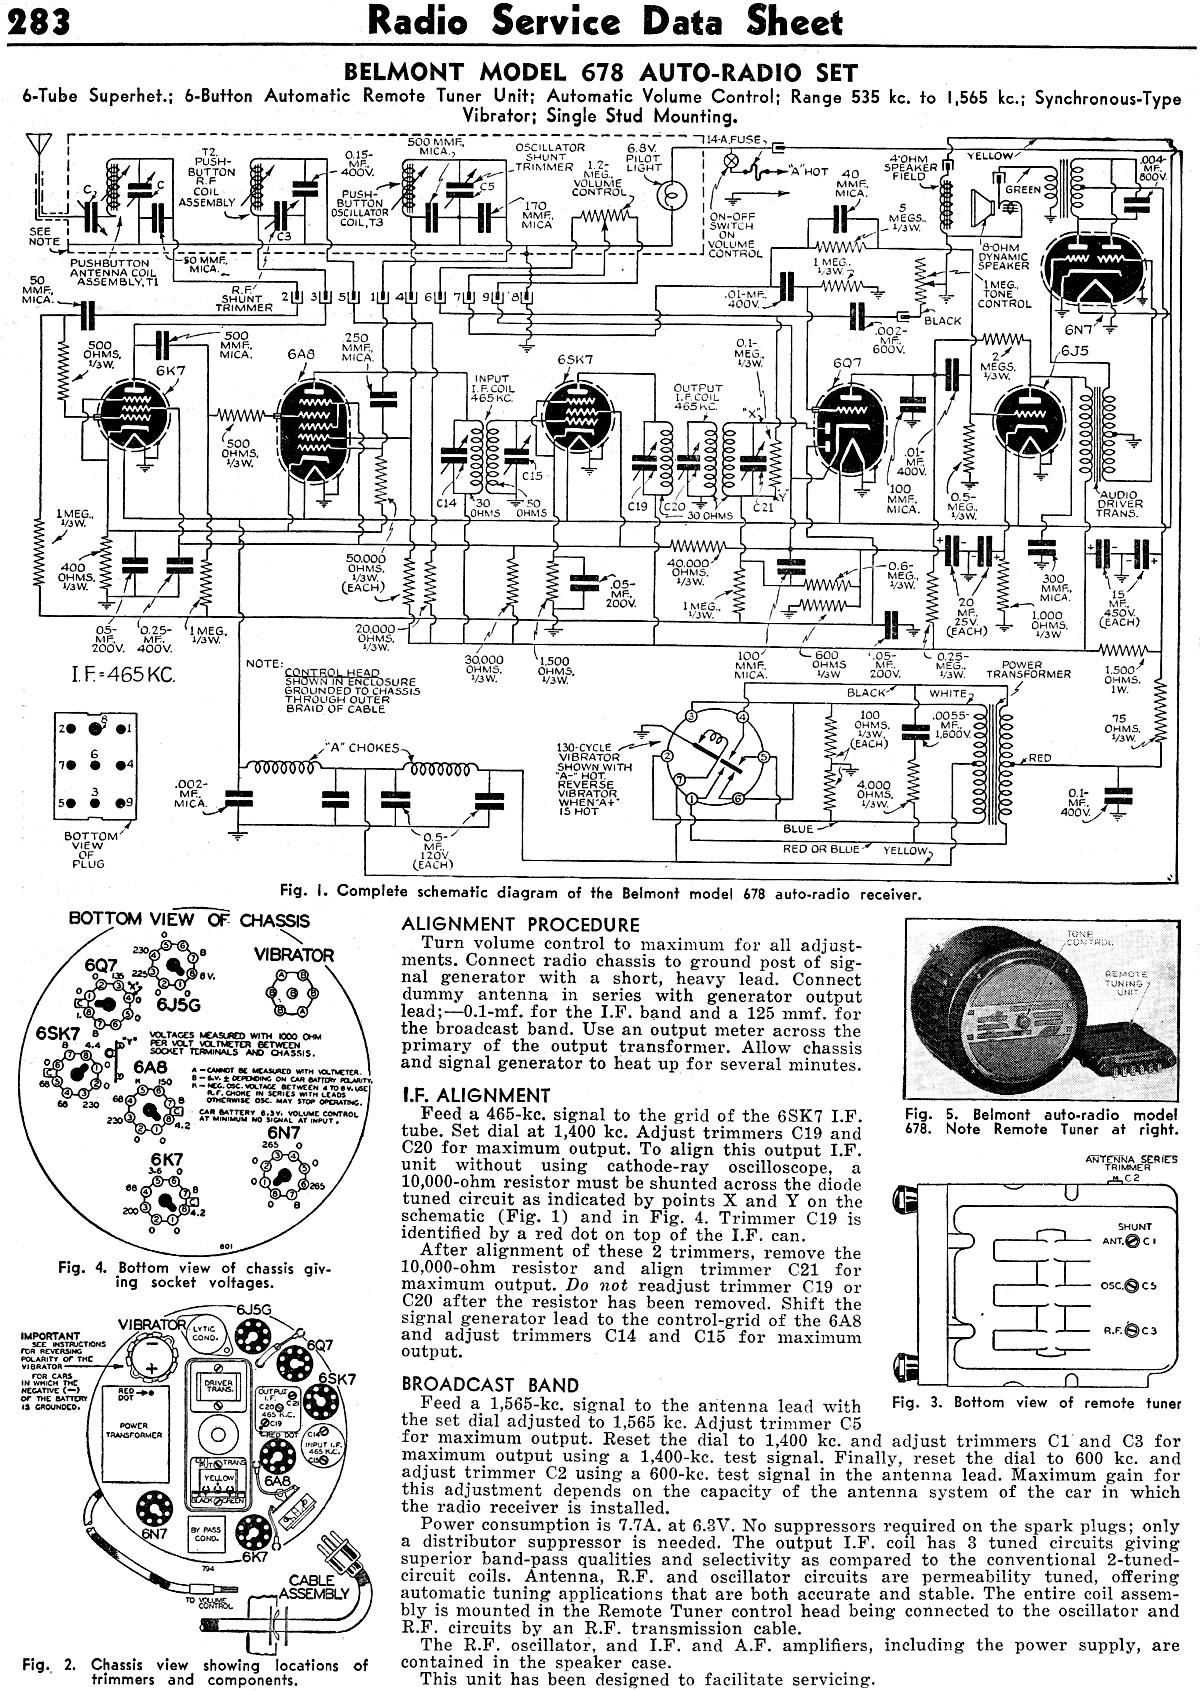 Belmont Model 678 Auto-Radio Set Radio Service Data Sheet